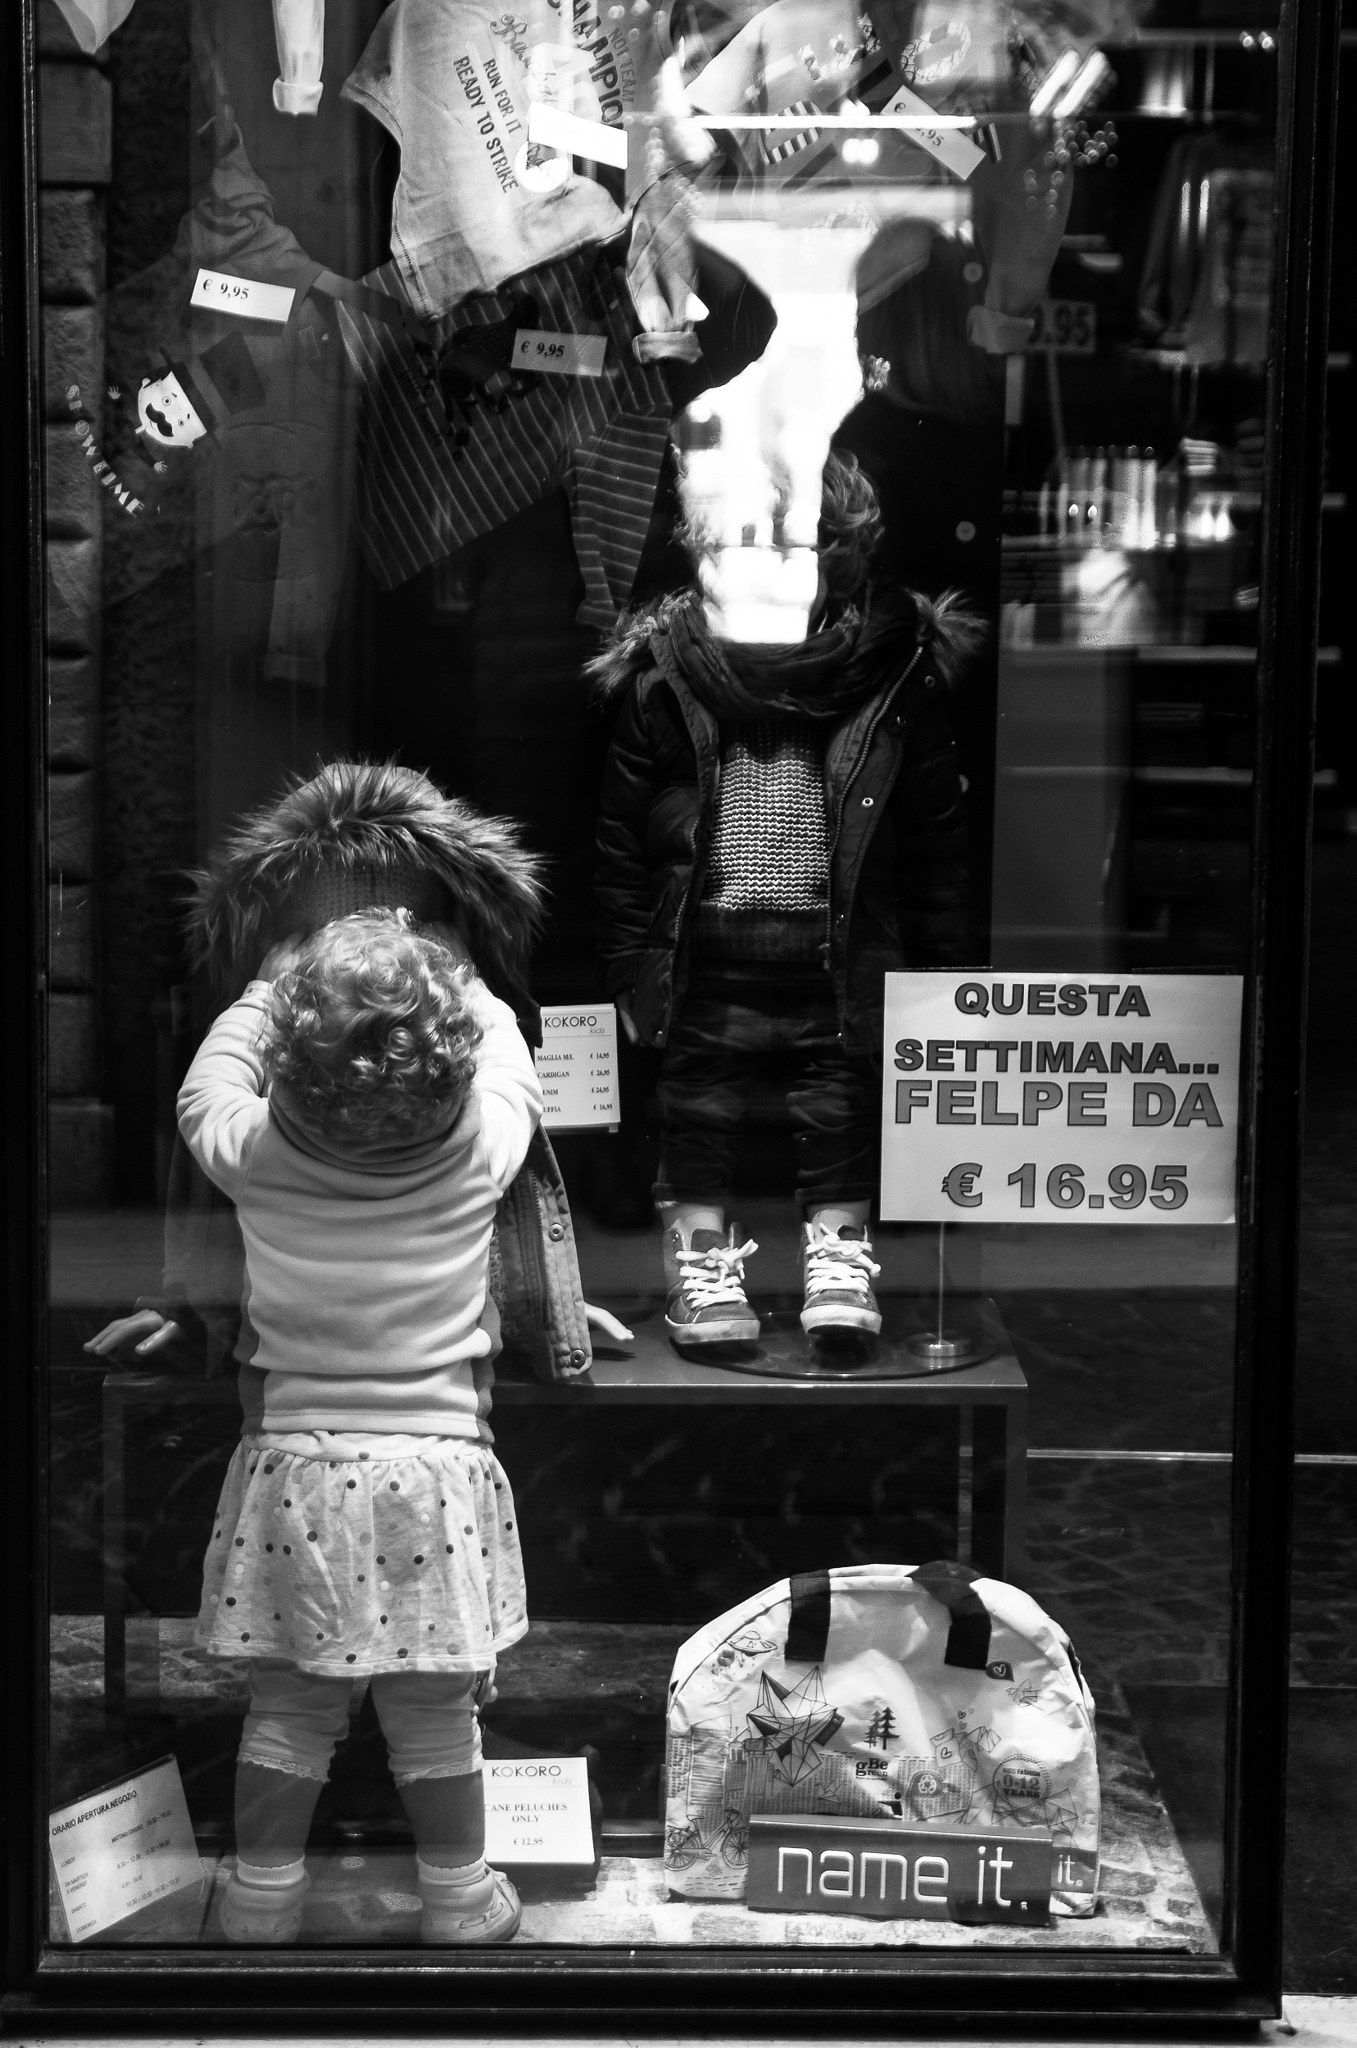 ..in vetrina.. by enricosottocorna